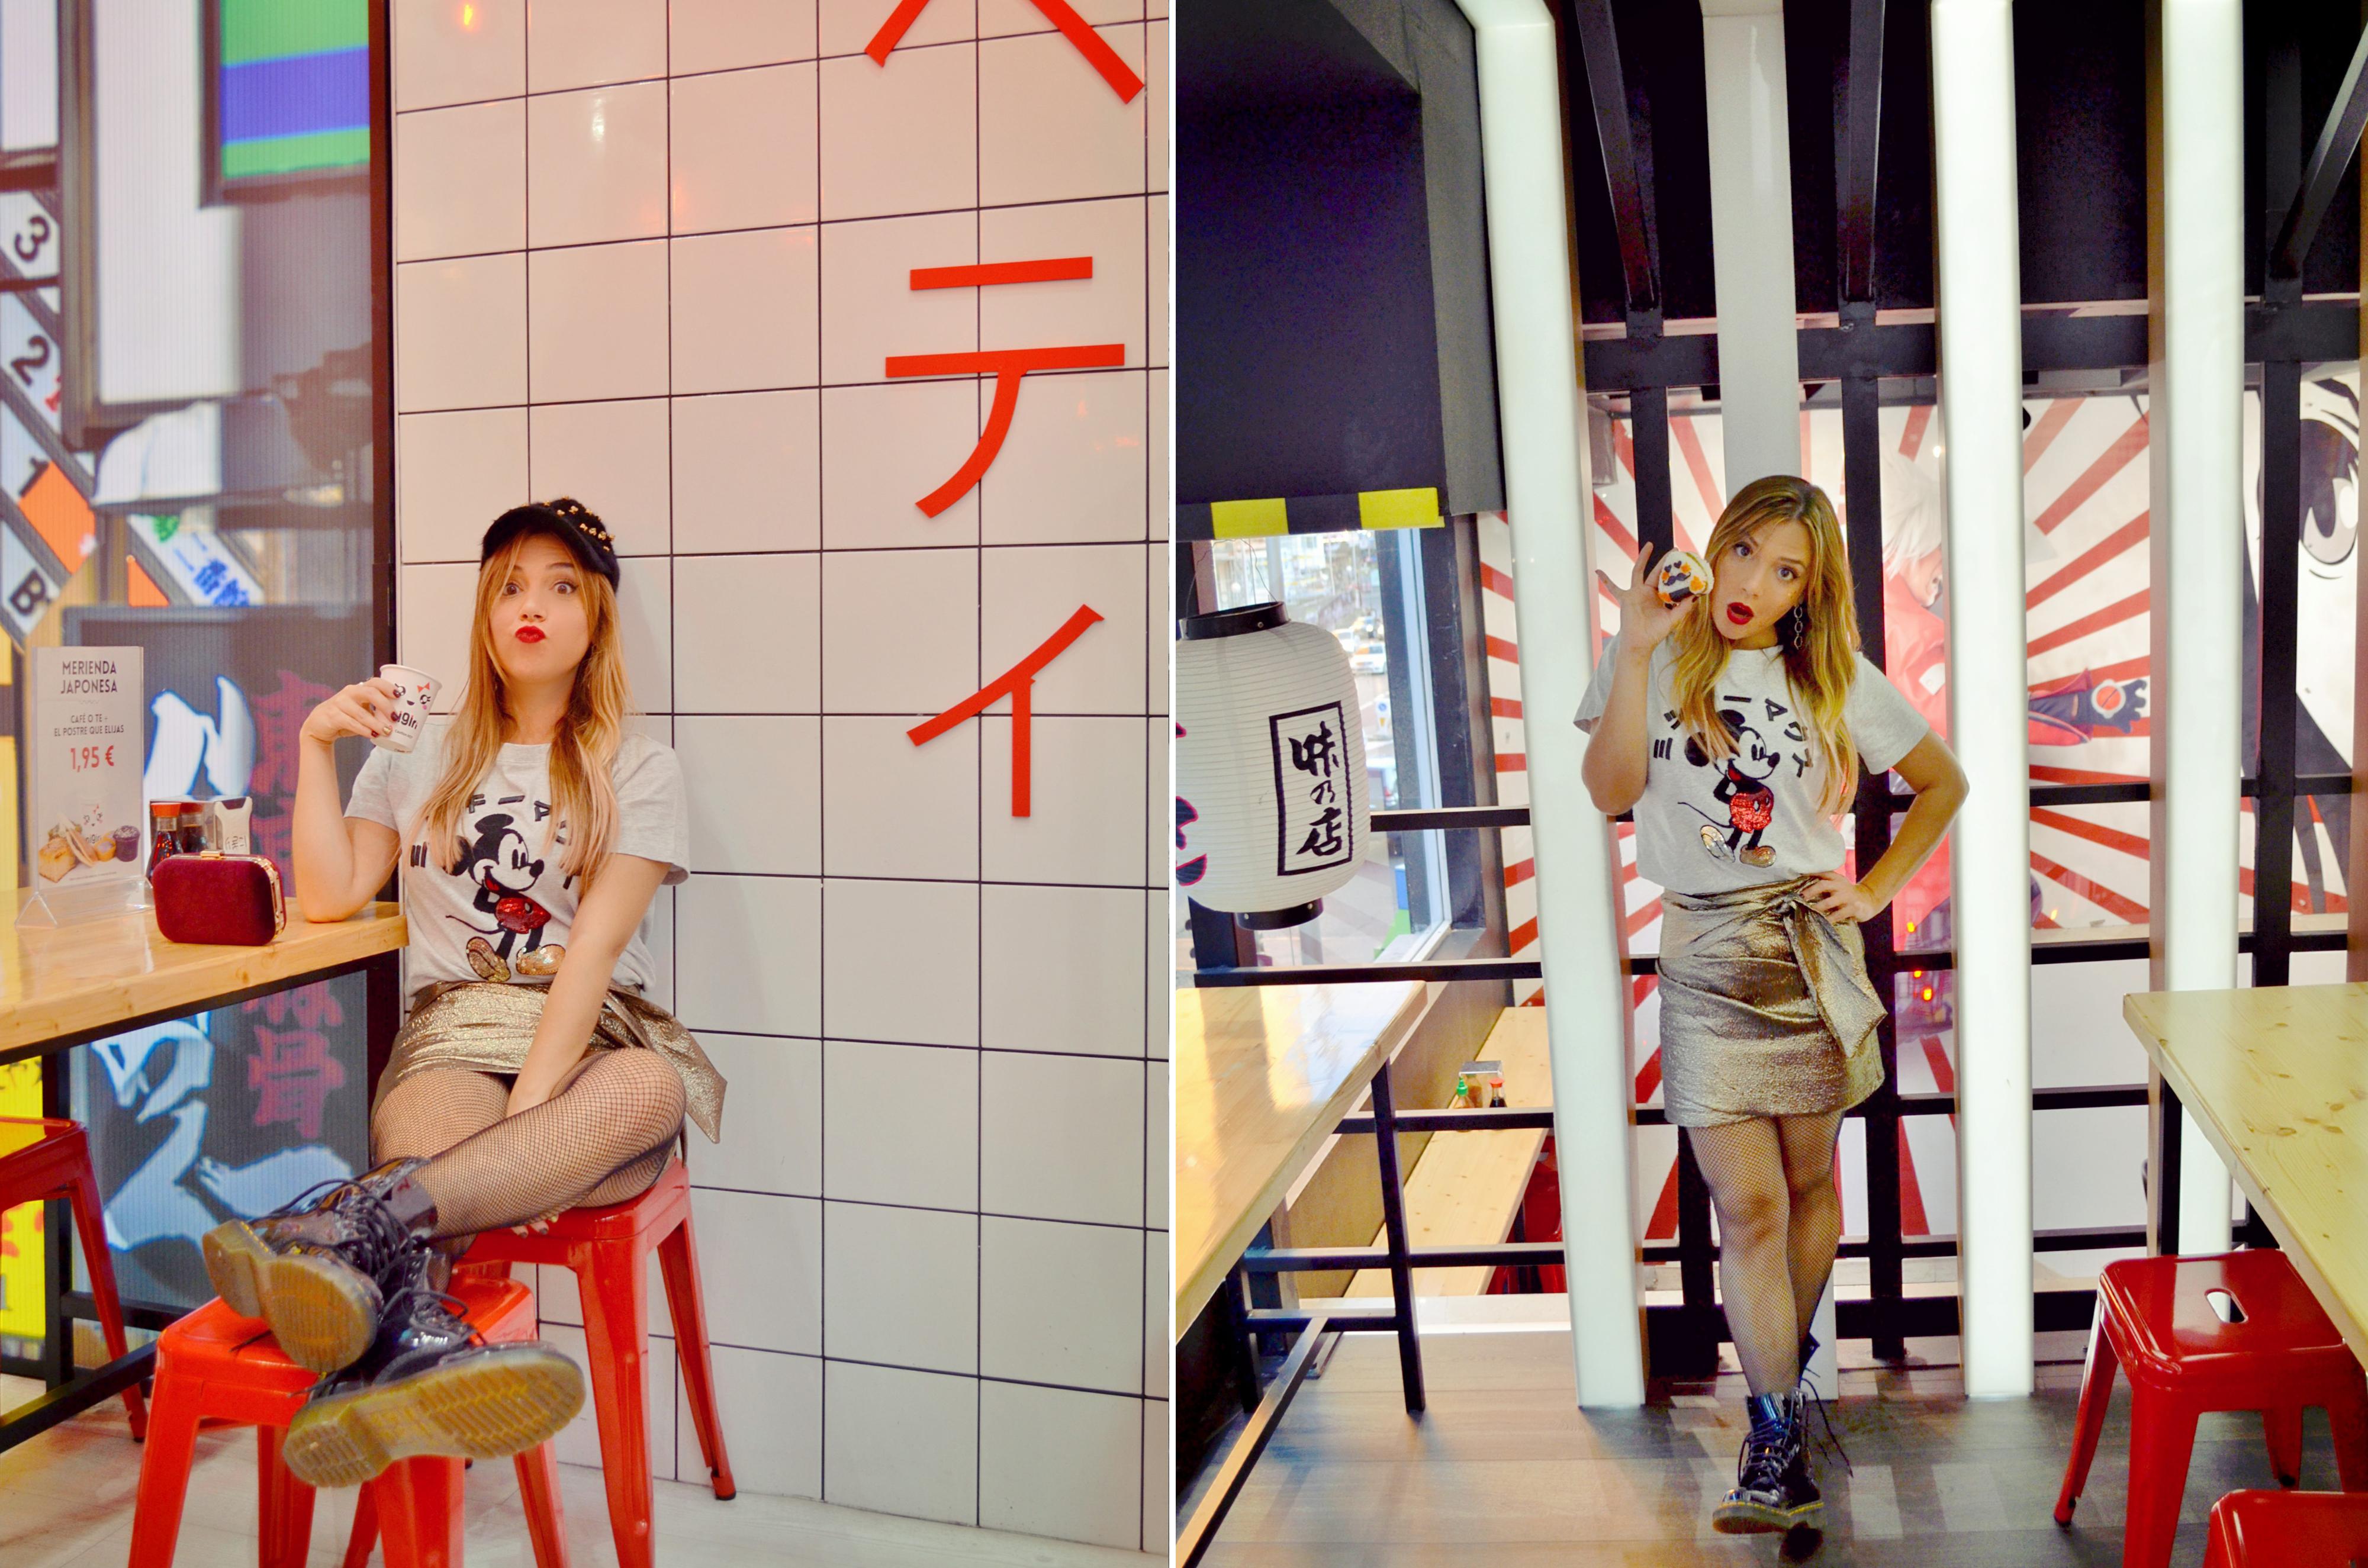 drmartens-look-blog-de-moda-ChicAdicta-fashionista-Chic-Adicta-influencer-Madrid-nigiri-mickey-outfit-PiensaenChic-Piensa-en-Chic